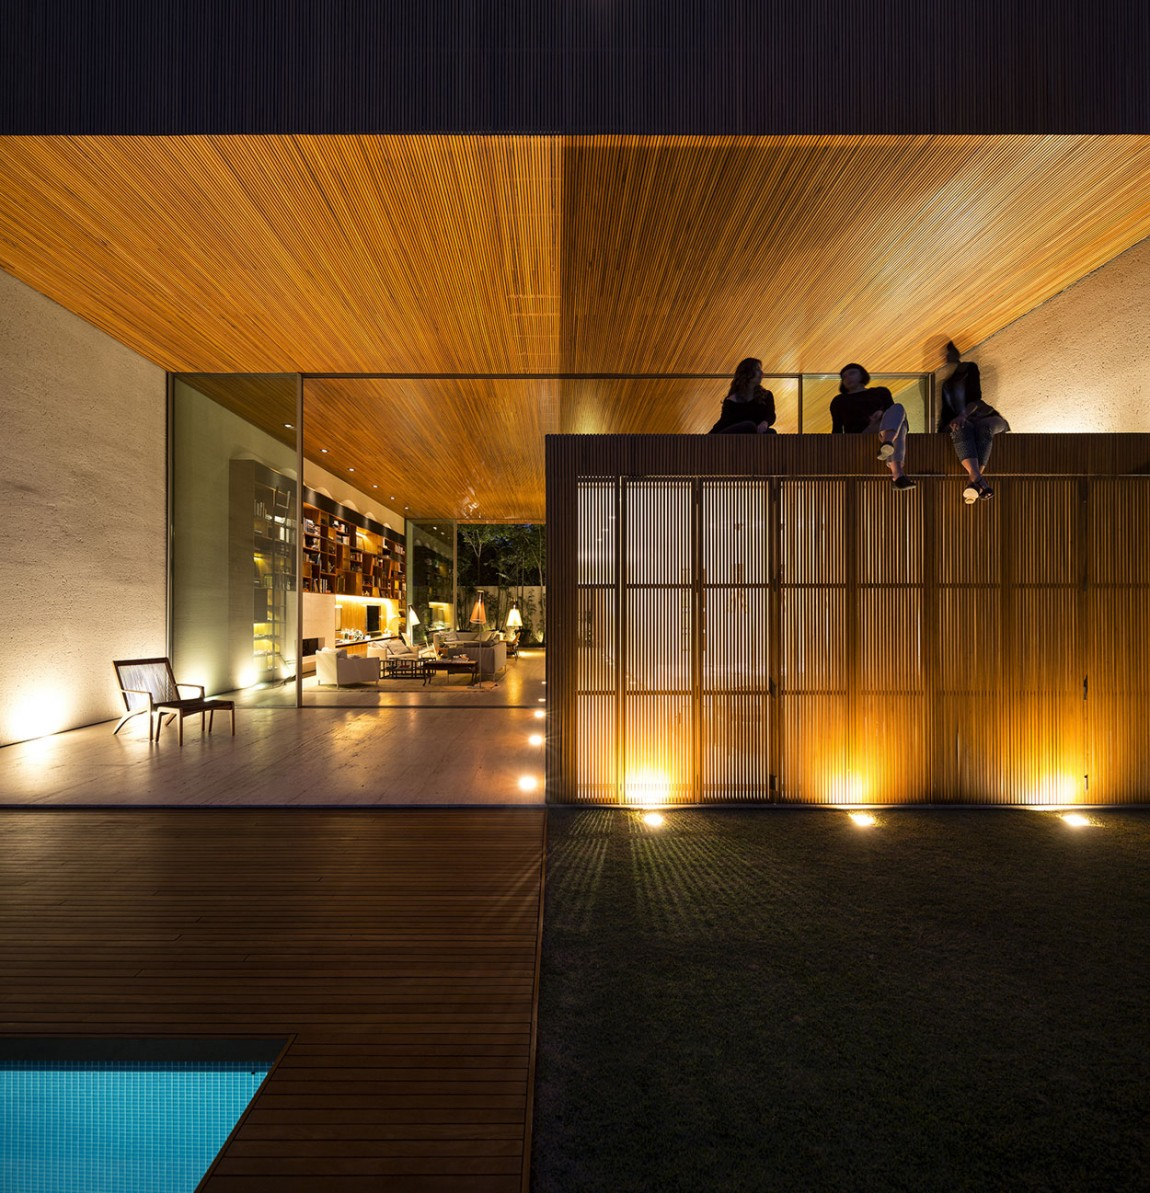 Summer House Ideas Interior >> Tetris House: A Creatively Organized Modern Brazilian Home